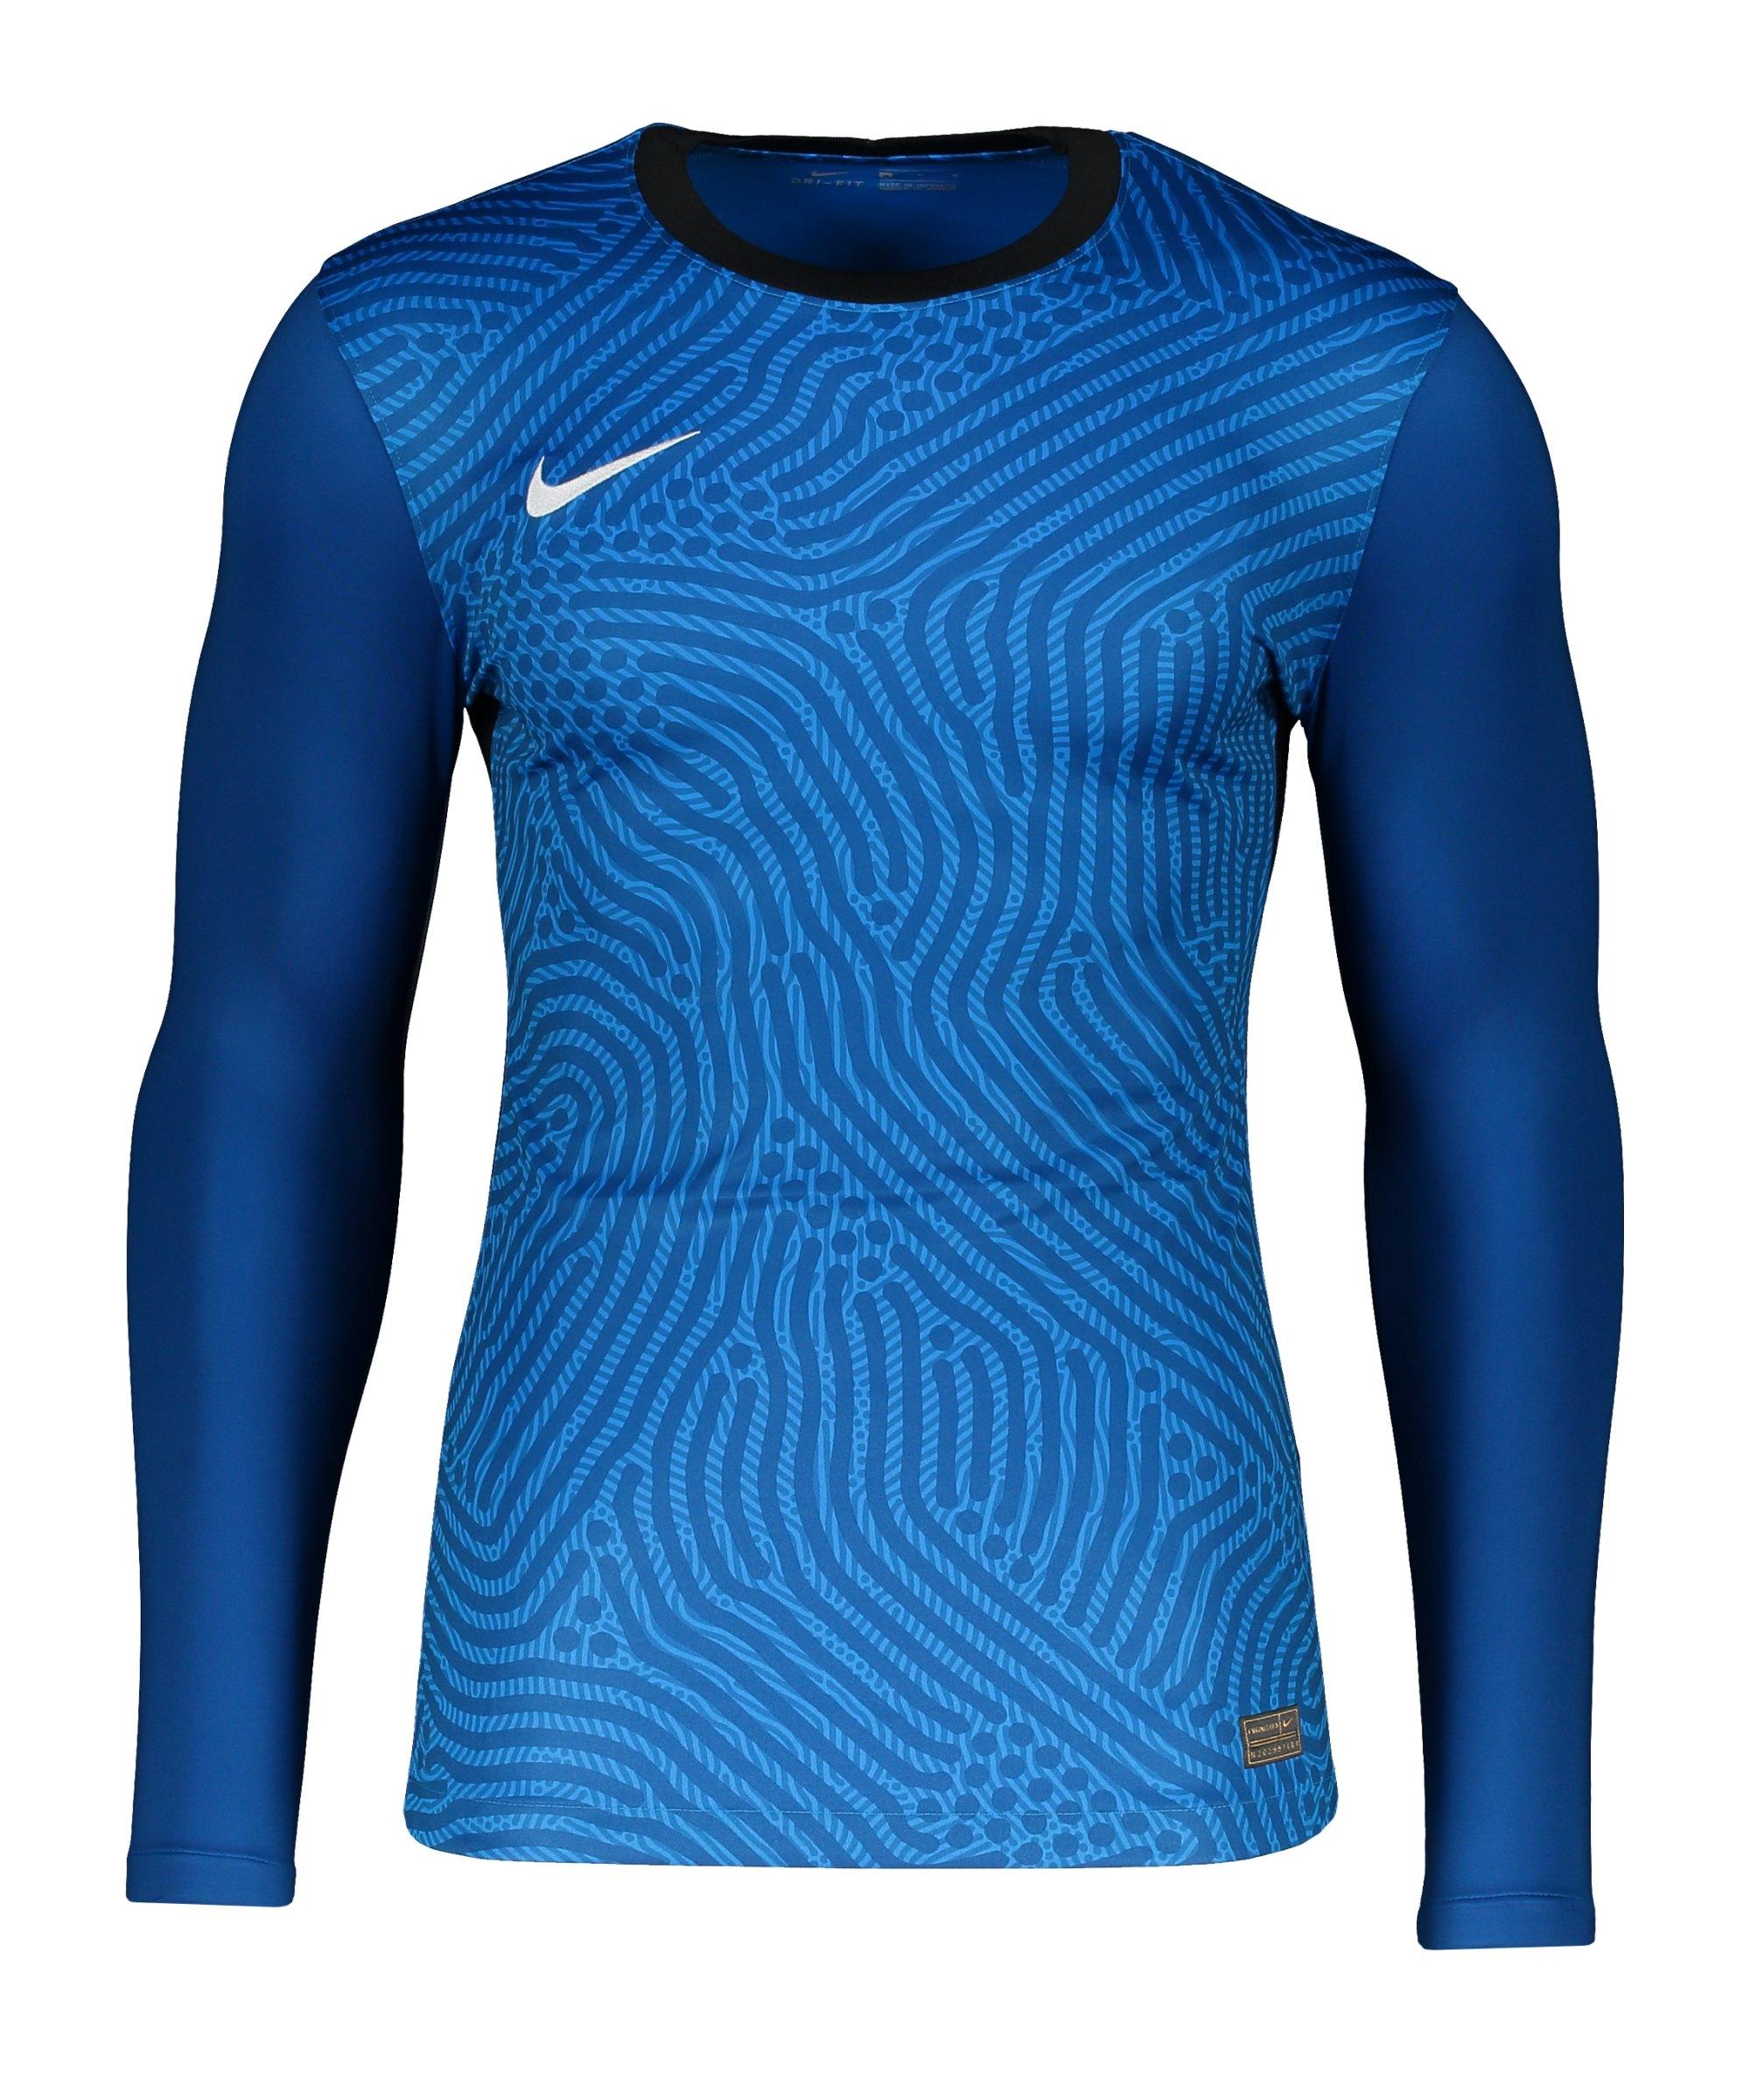 Nike Promo TW-Trikot langarm Blau F406 - blau